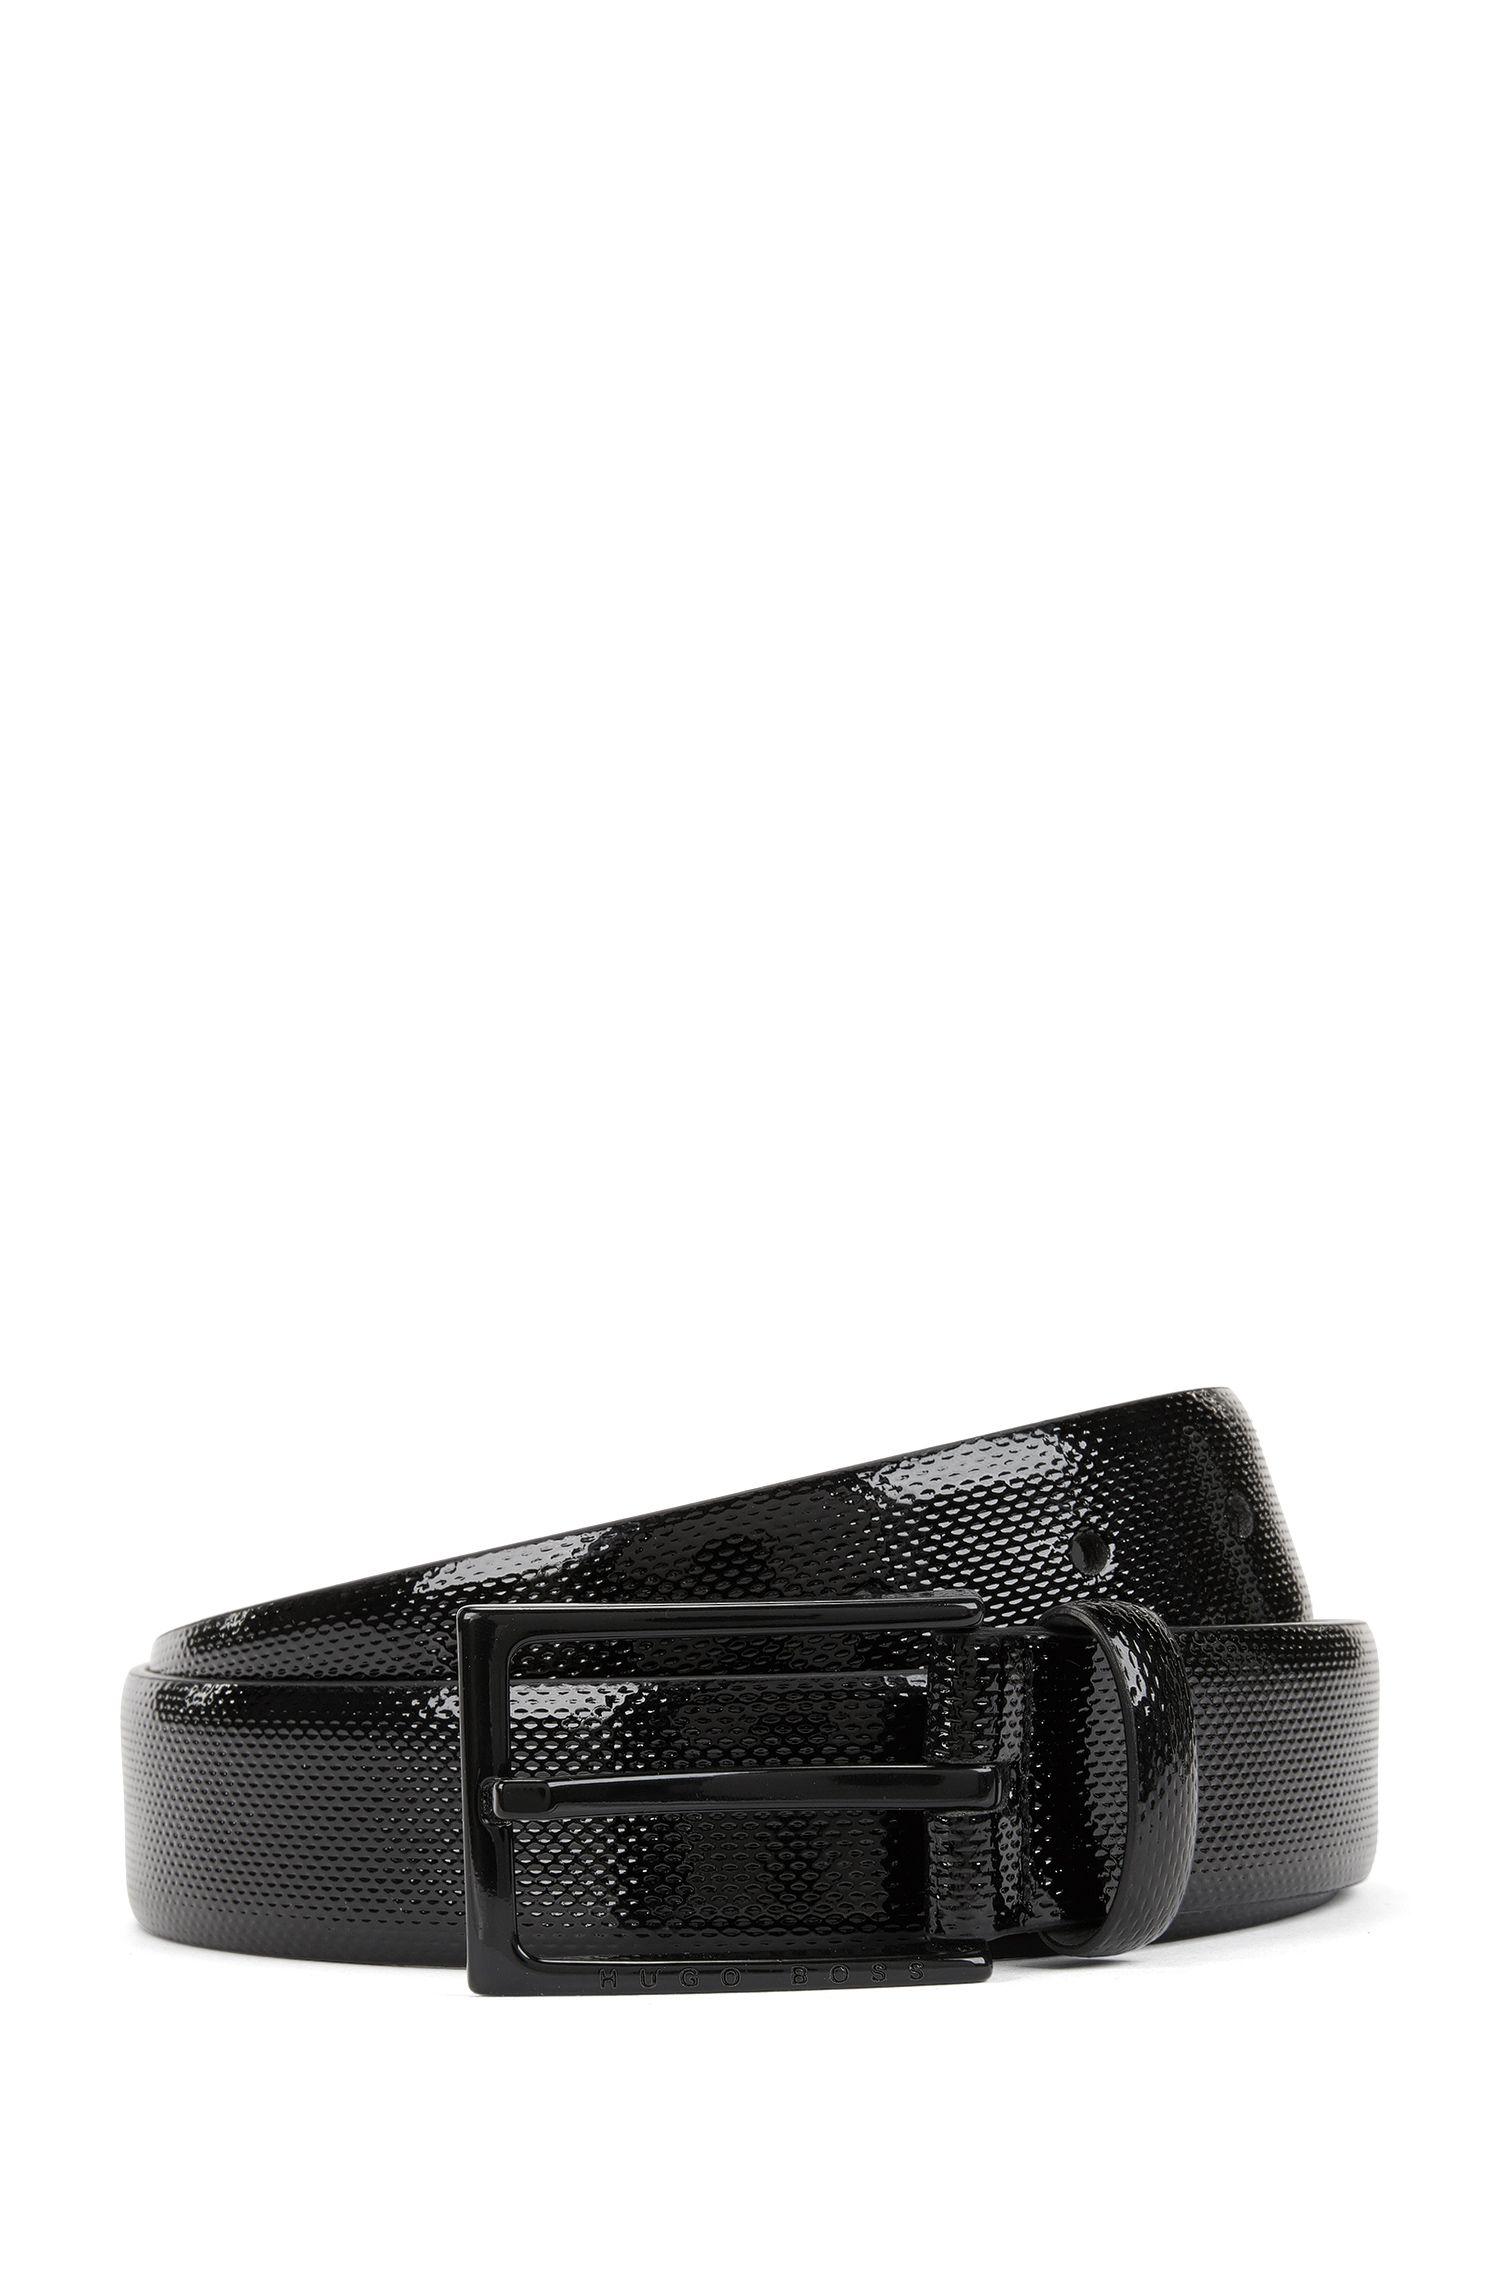 Embossed Patent Leather Belt | Cedry, Black